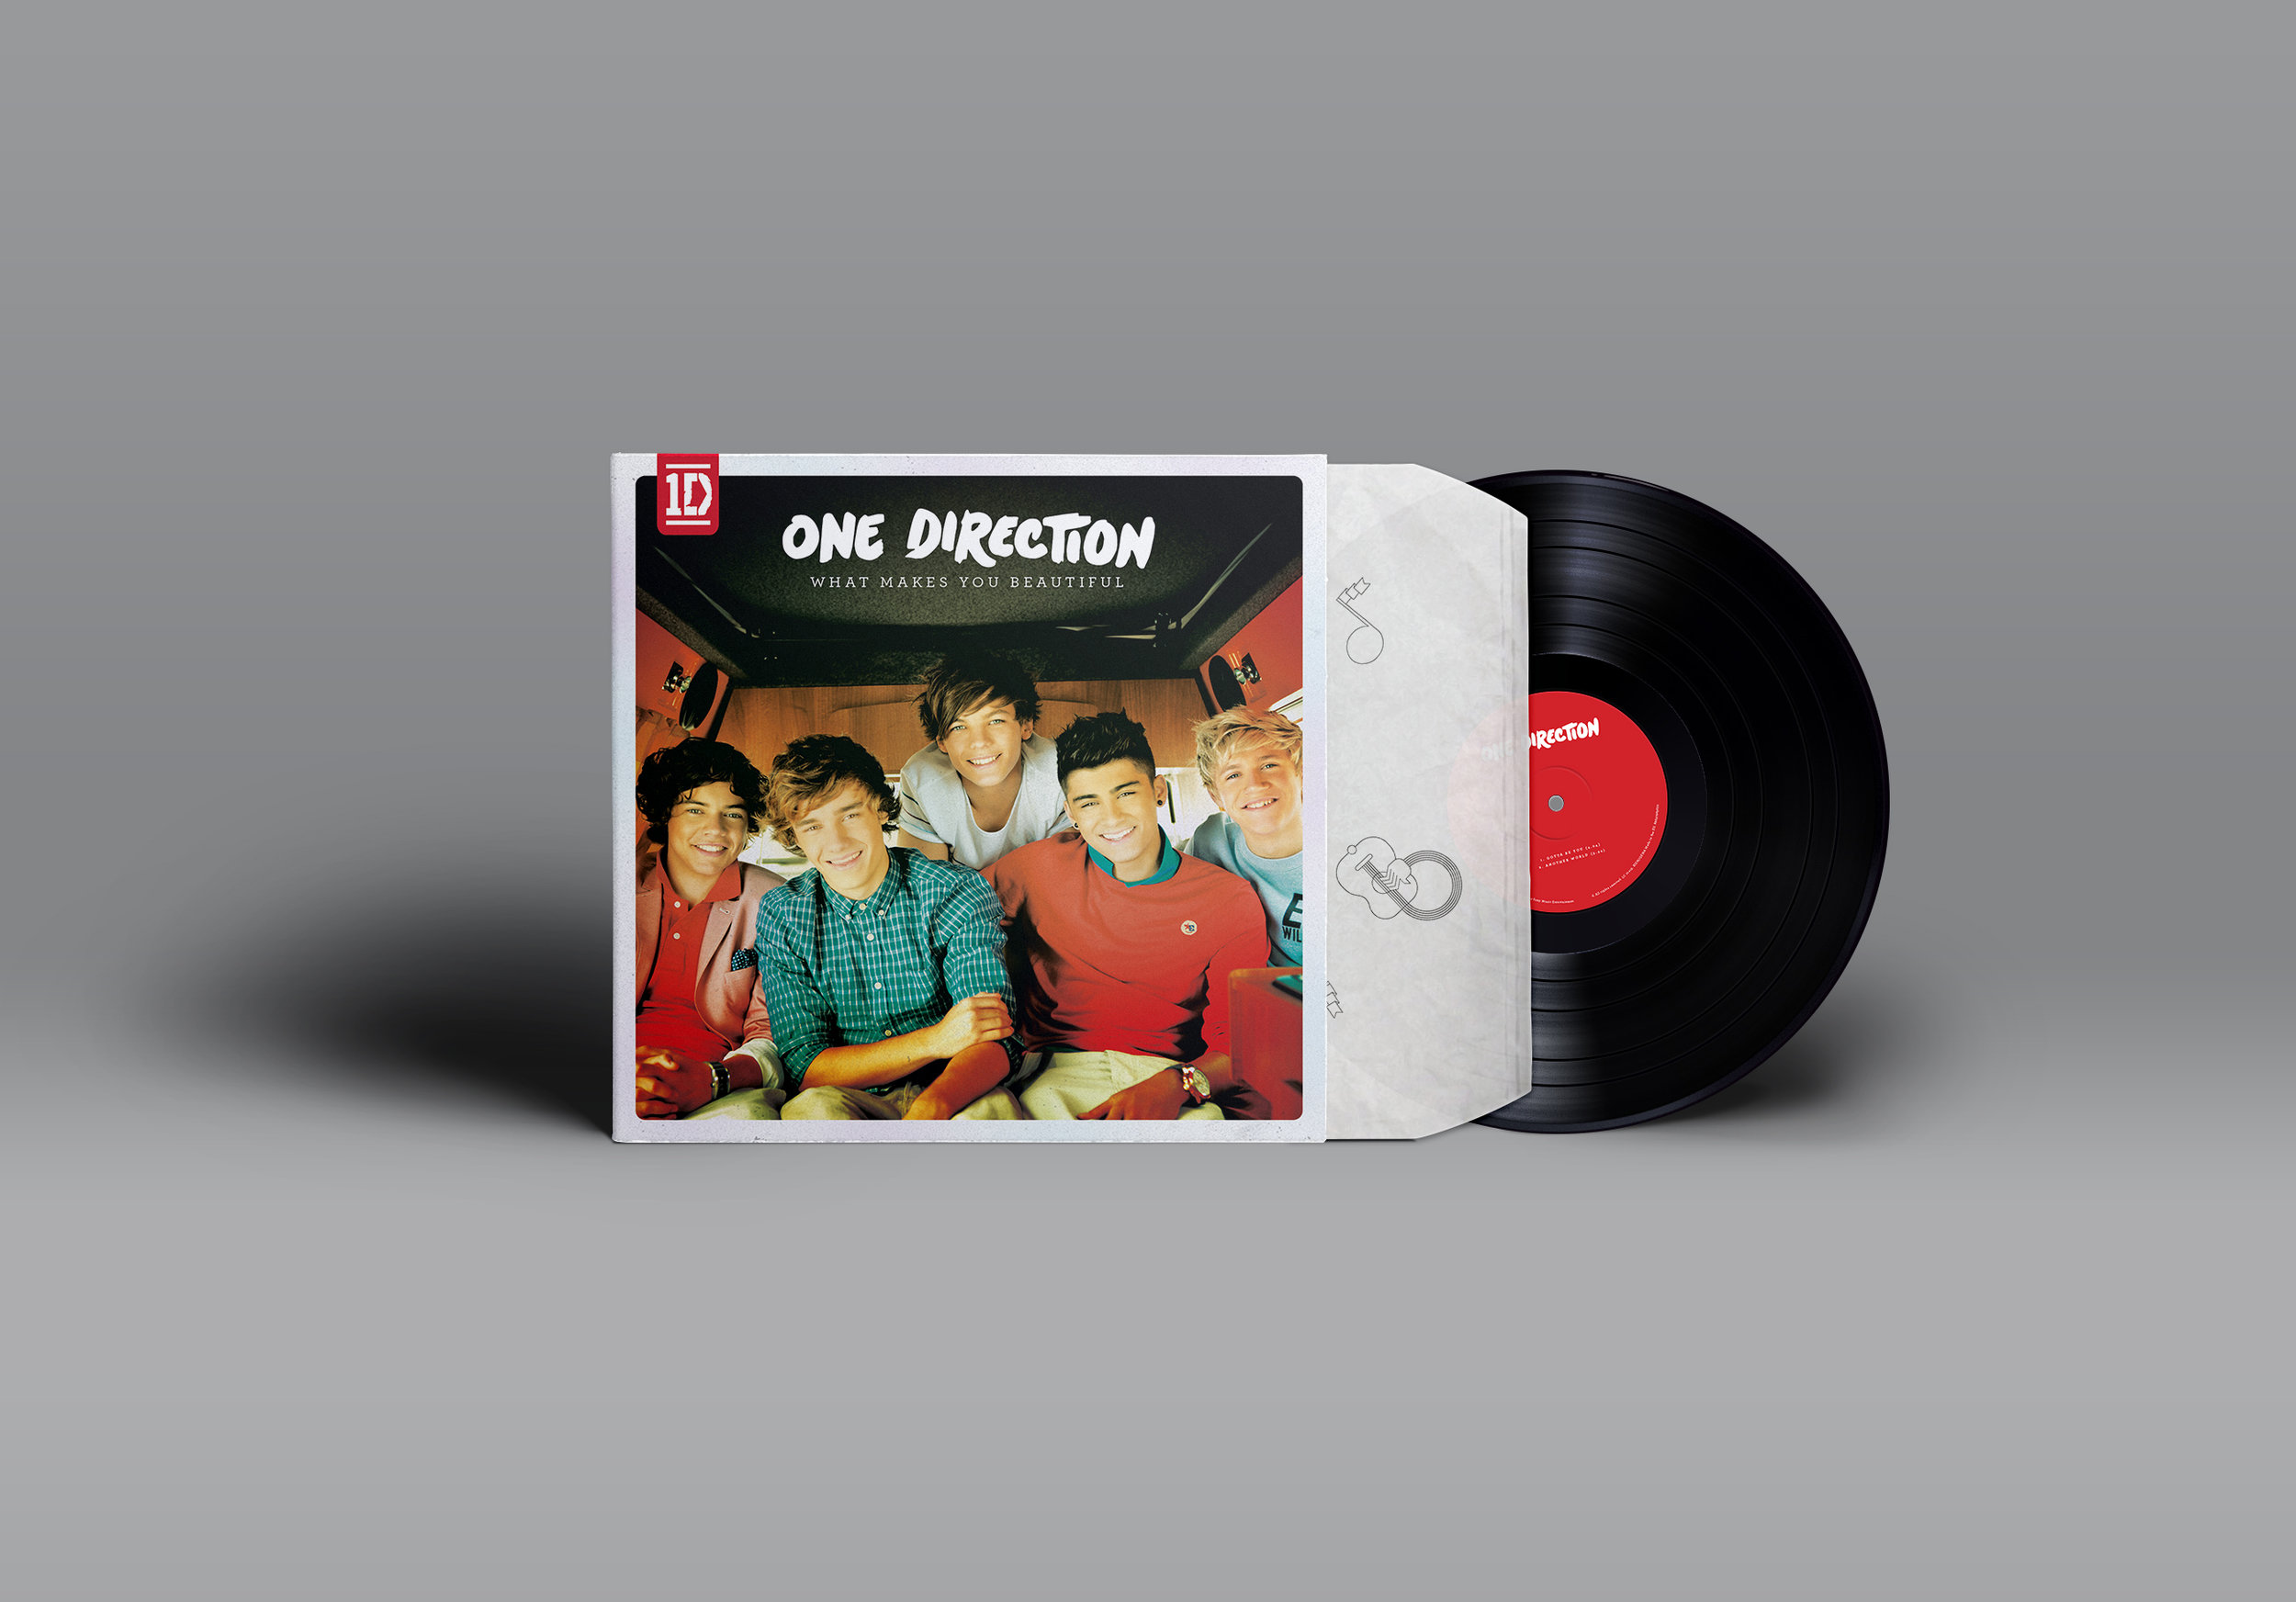 1D_Vinyl.jpg